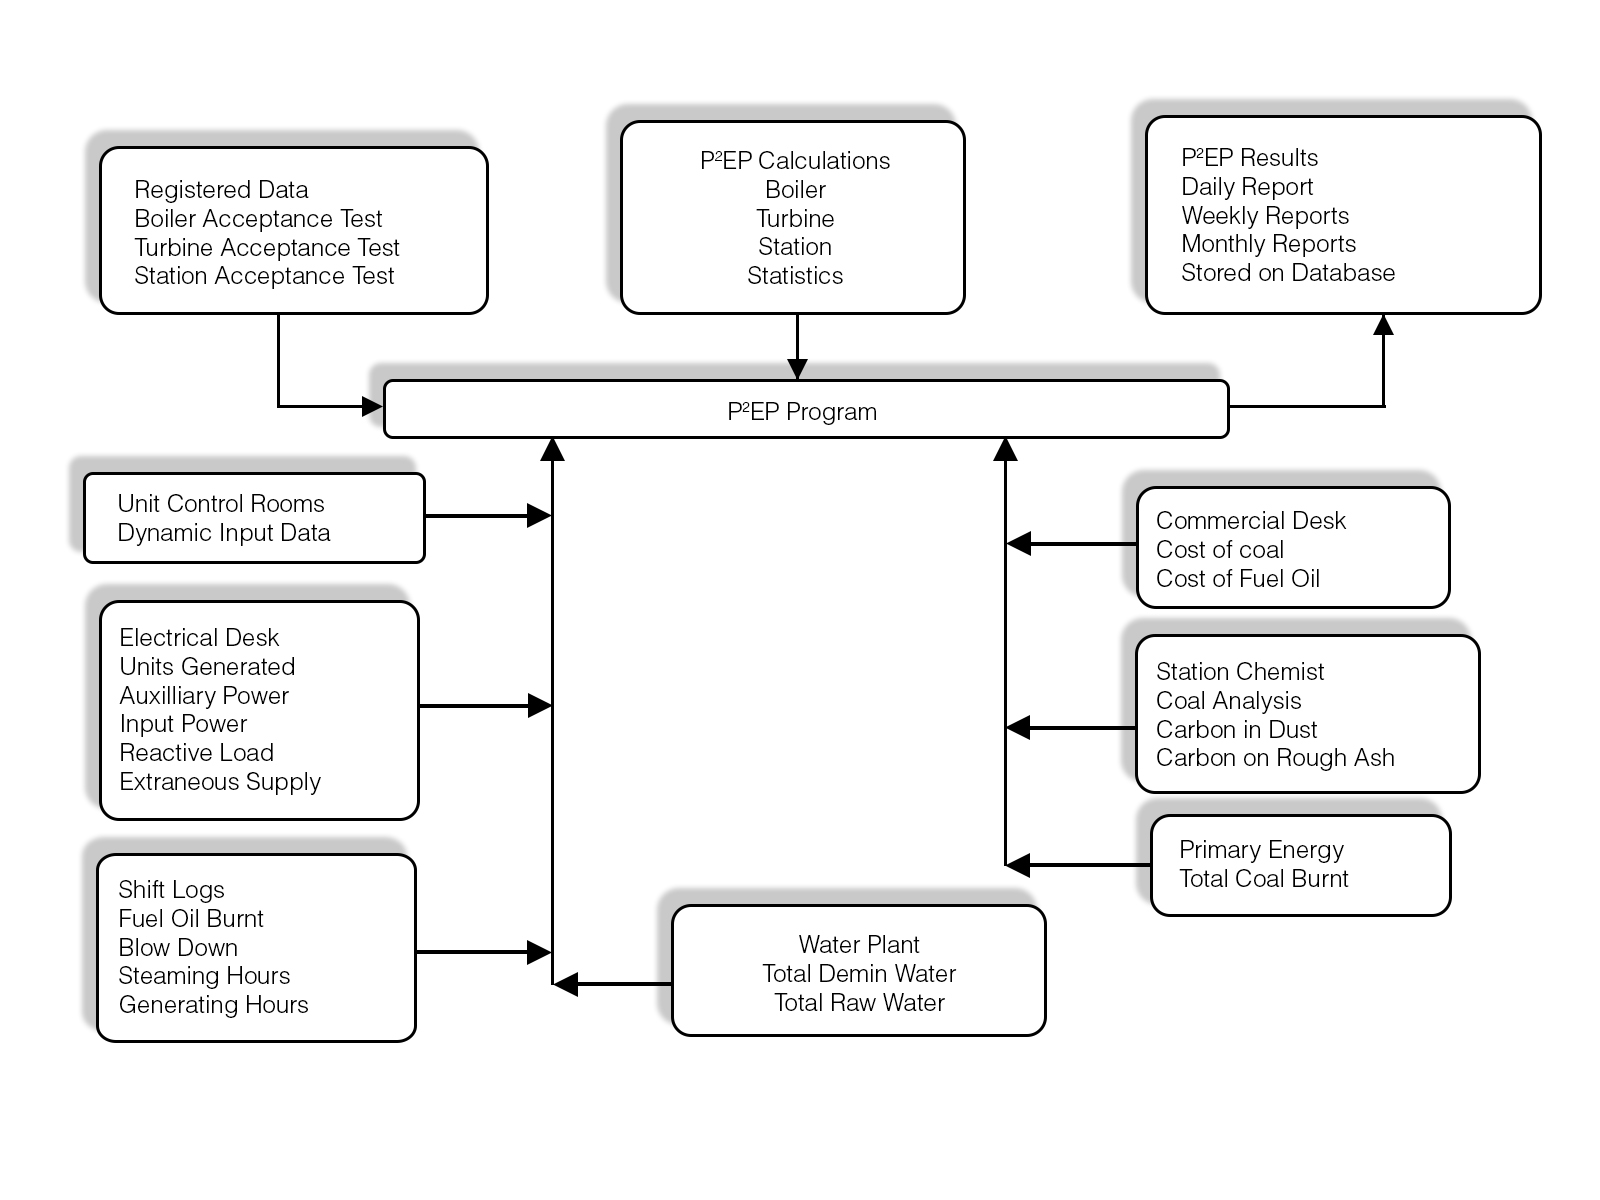 Power Plant Efficiency Program - P2EP